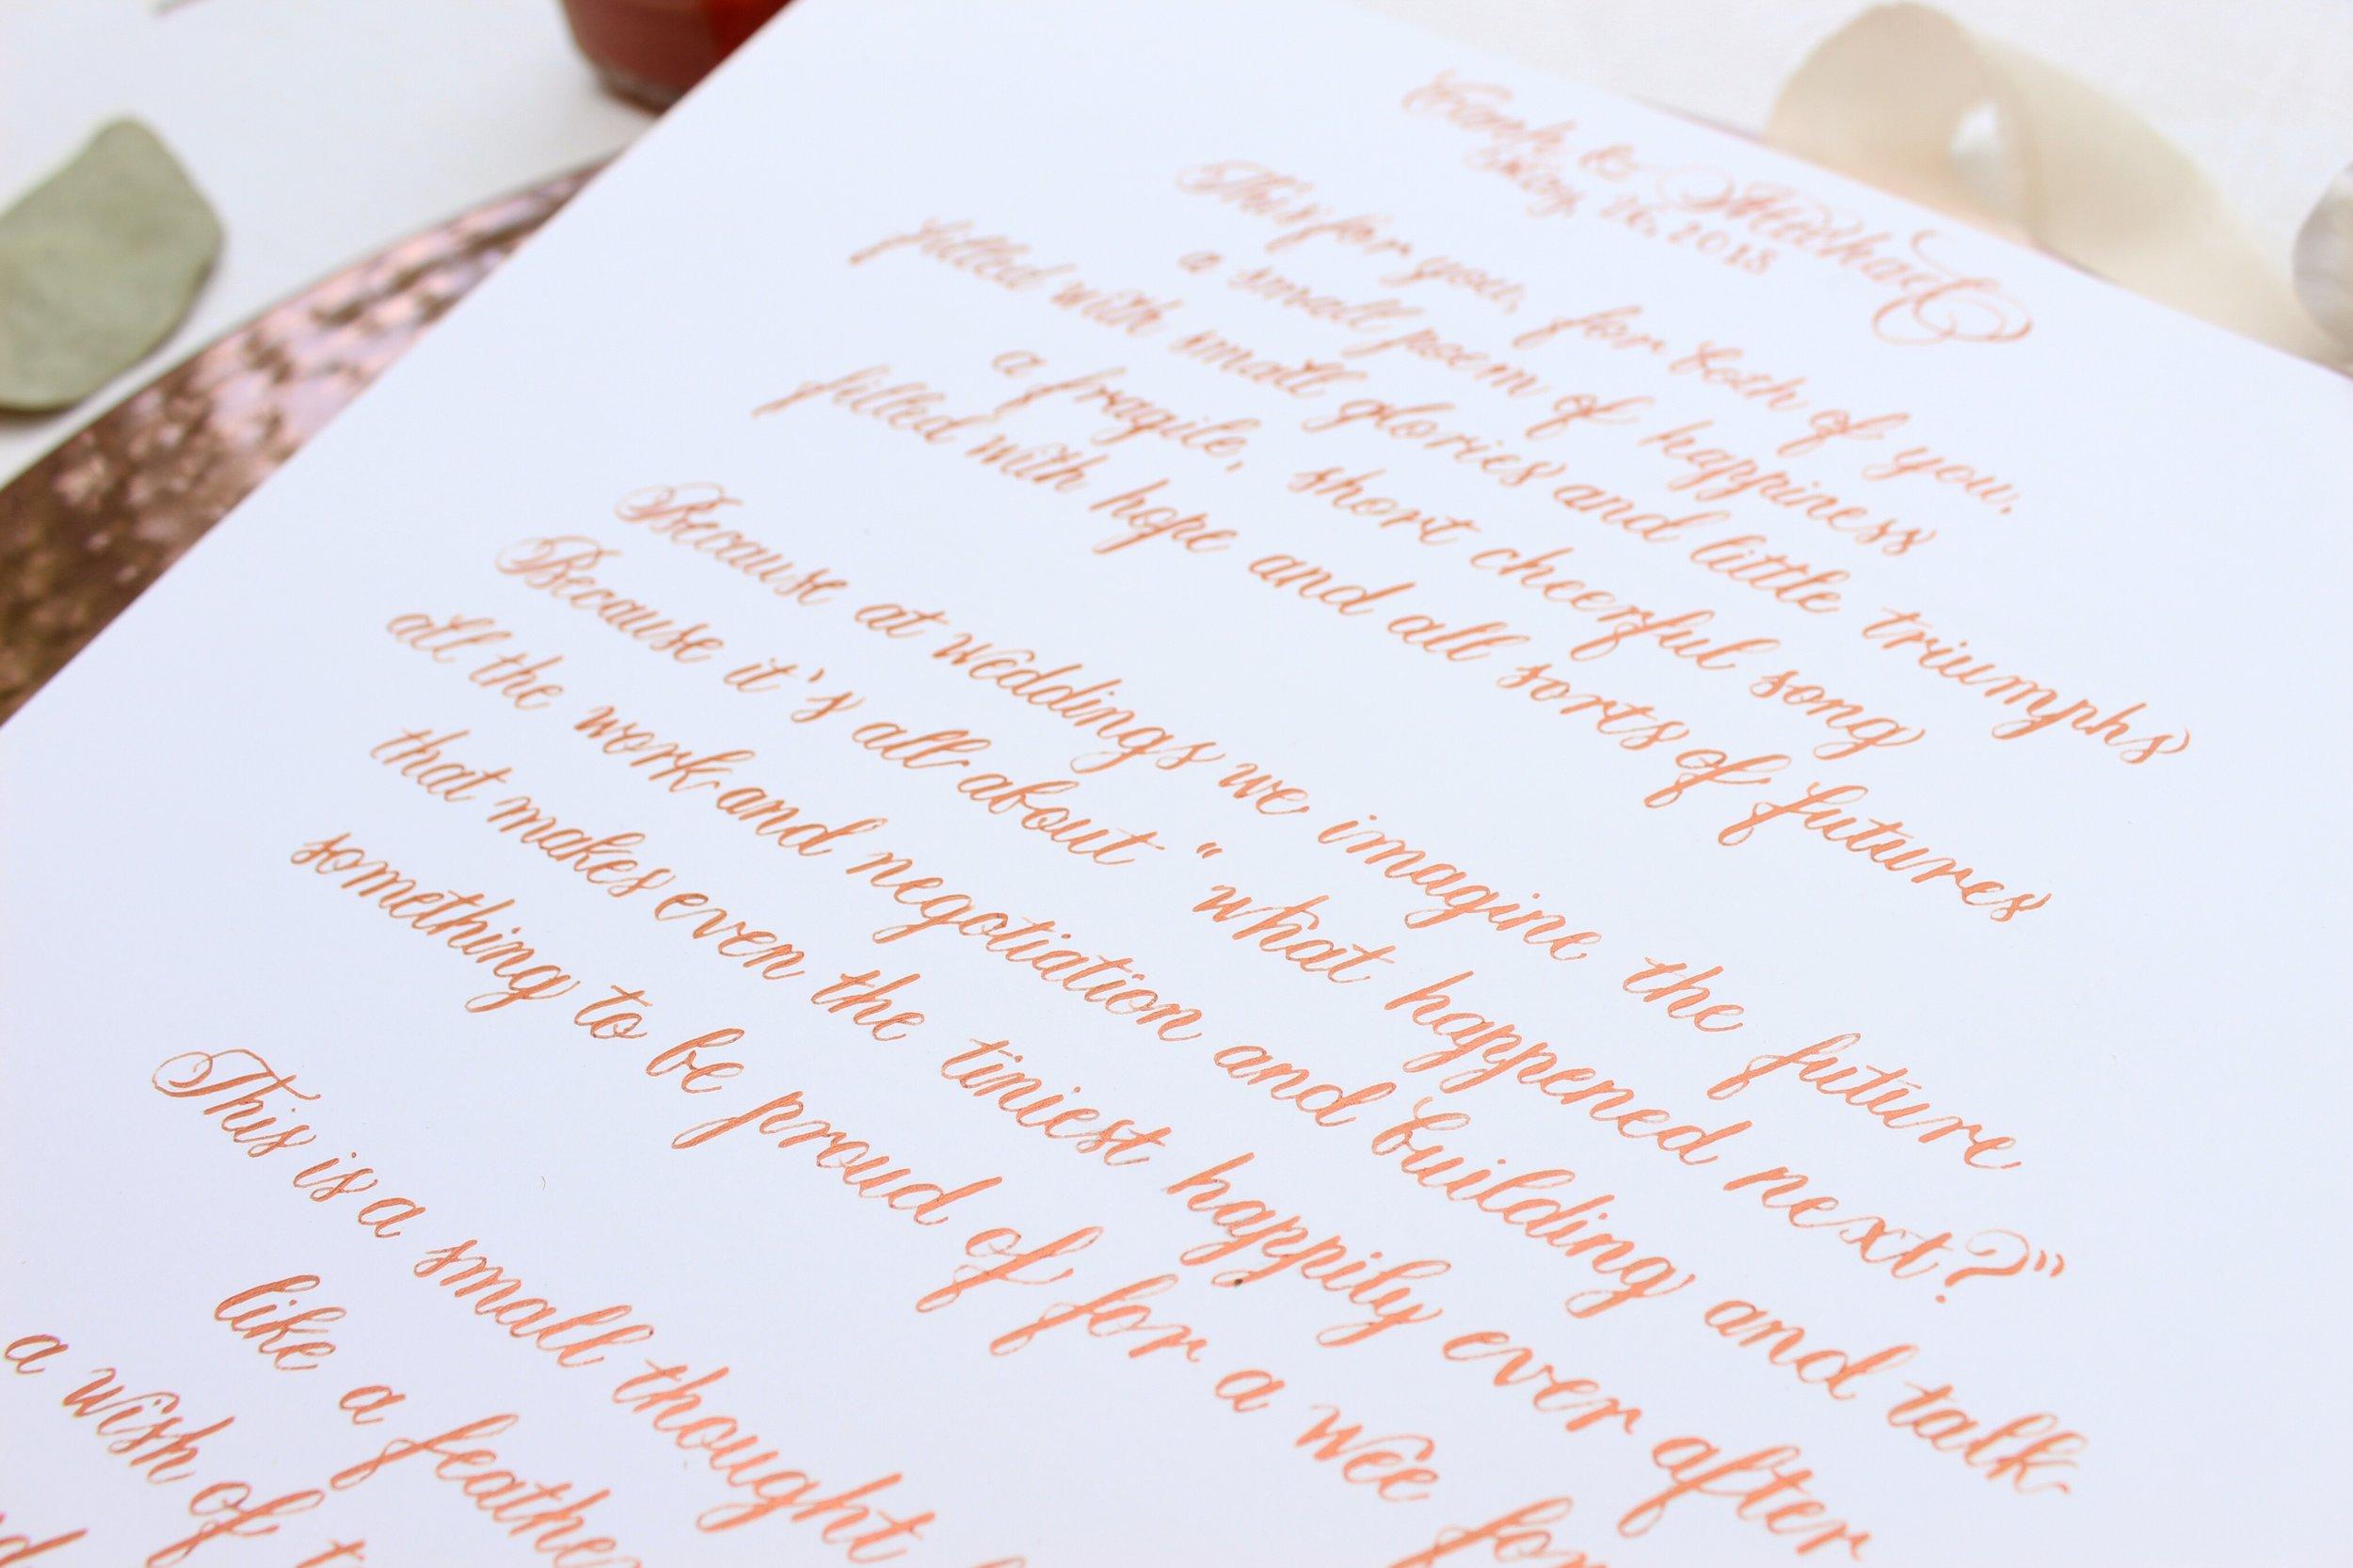 Central PA, York PA, JesSmith Designs, custom, wedding, invitations, bridal, announcements, save the date, baby, hanover, calligraphy, baltimore, wedding invitations, lancaster, gettysburg-05-11 19.08.36.jpg